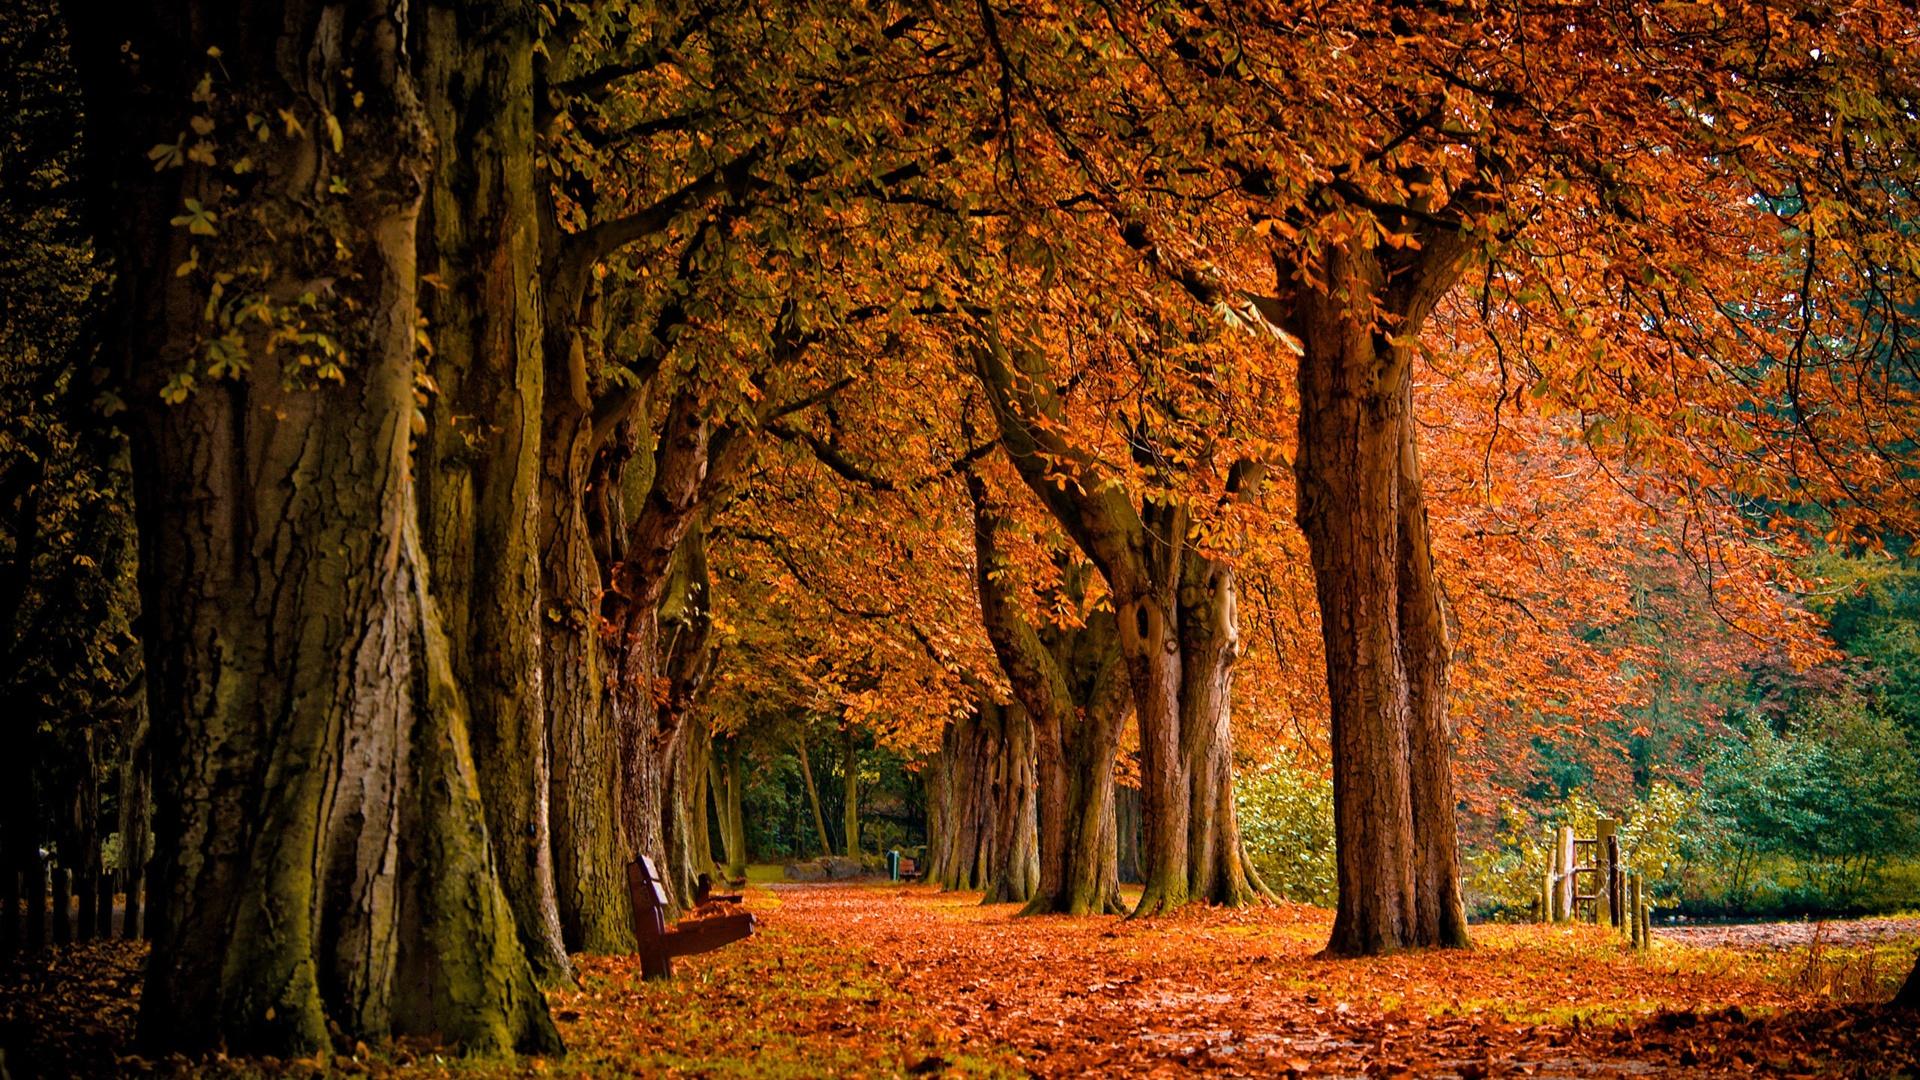 Autumn Park HD Wallpapers Full HD Desktop Wallpapers 1080p 1920x1080